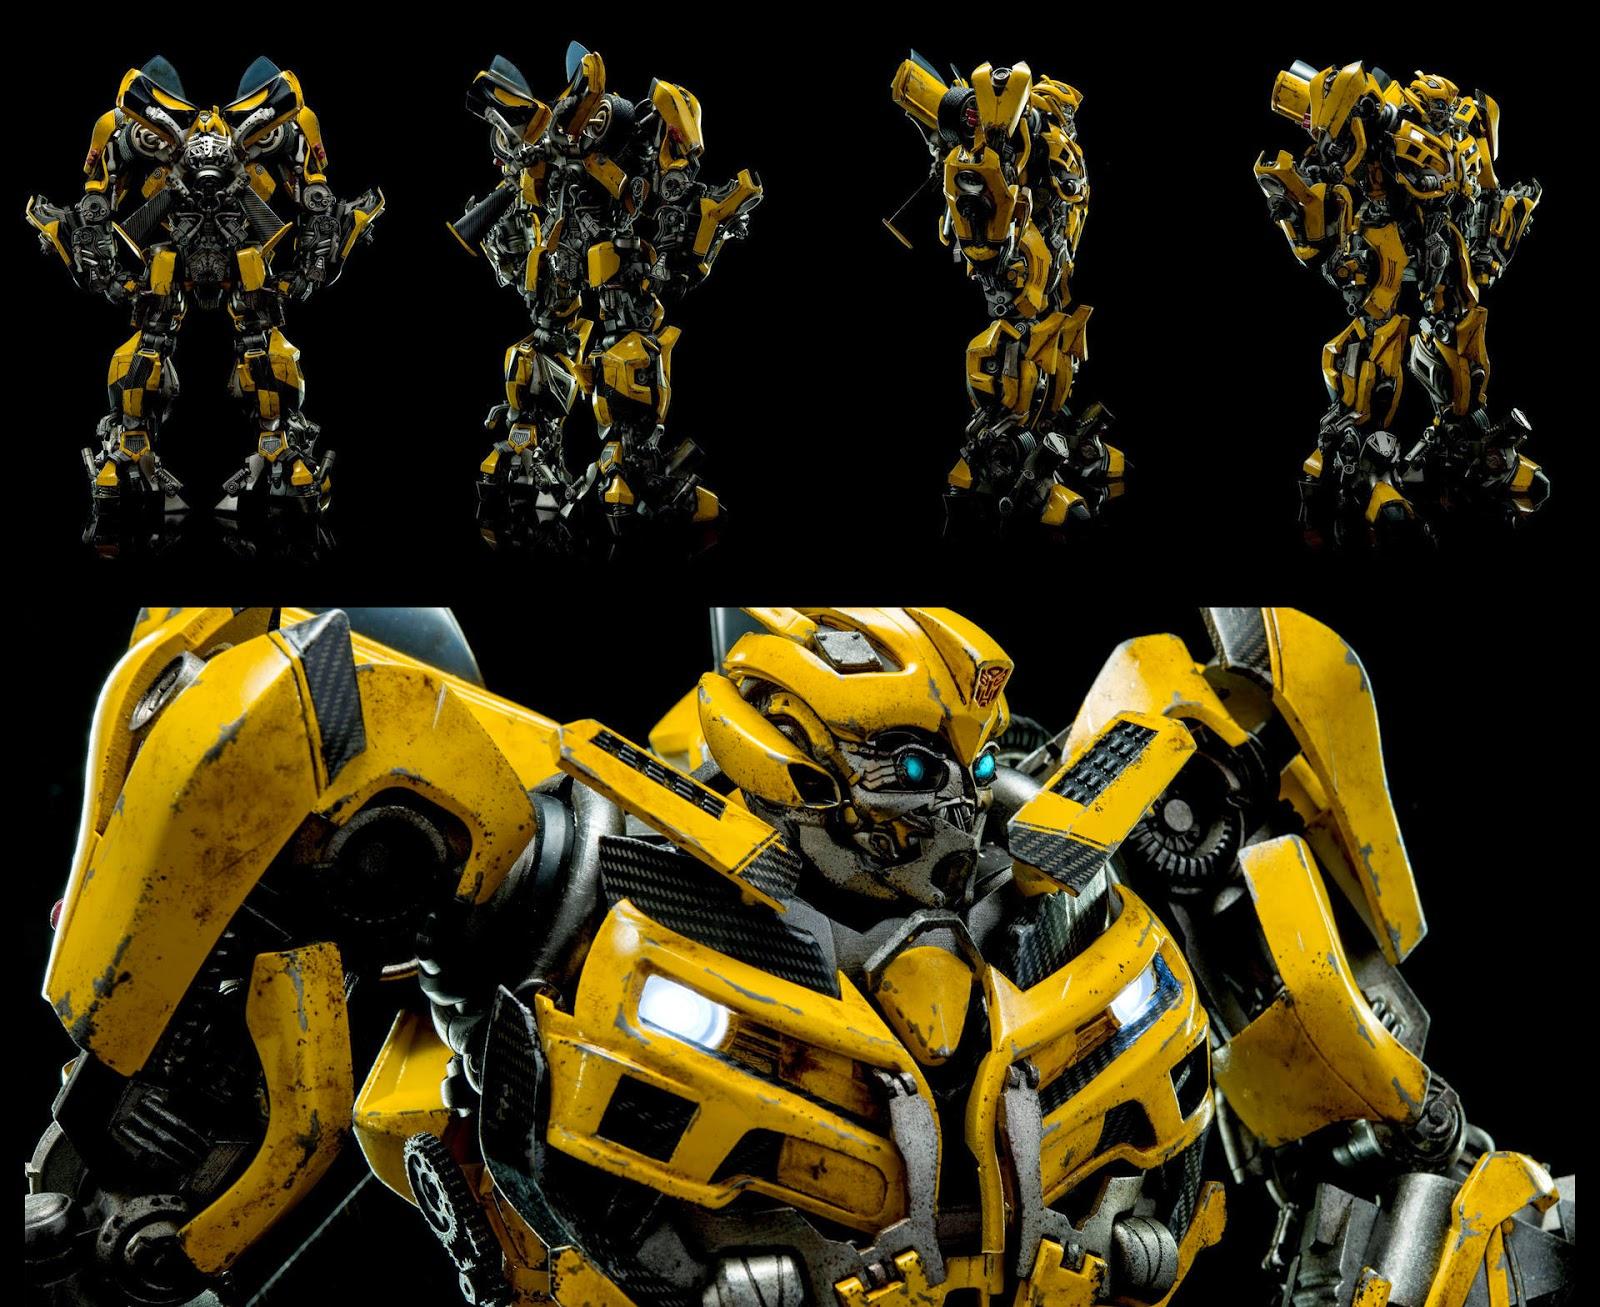 a r t i c u l a t e m e threea transformers bumblebee